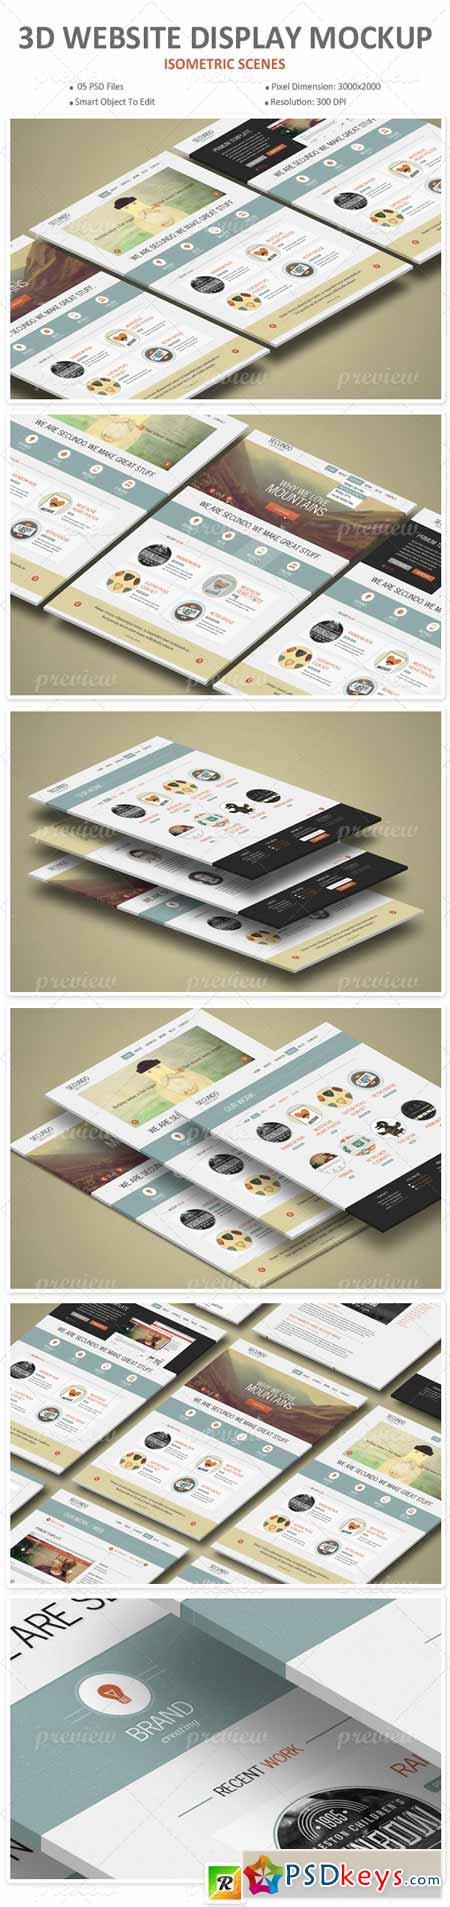 3d Website Display Mockup 2837